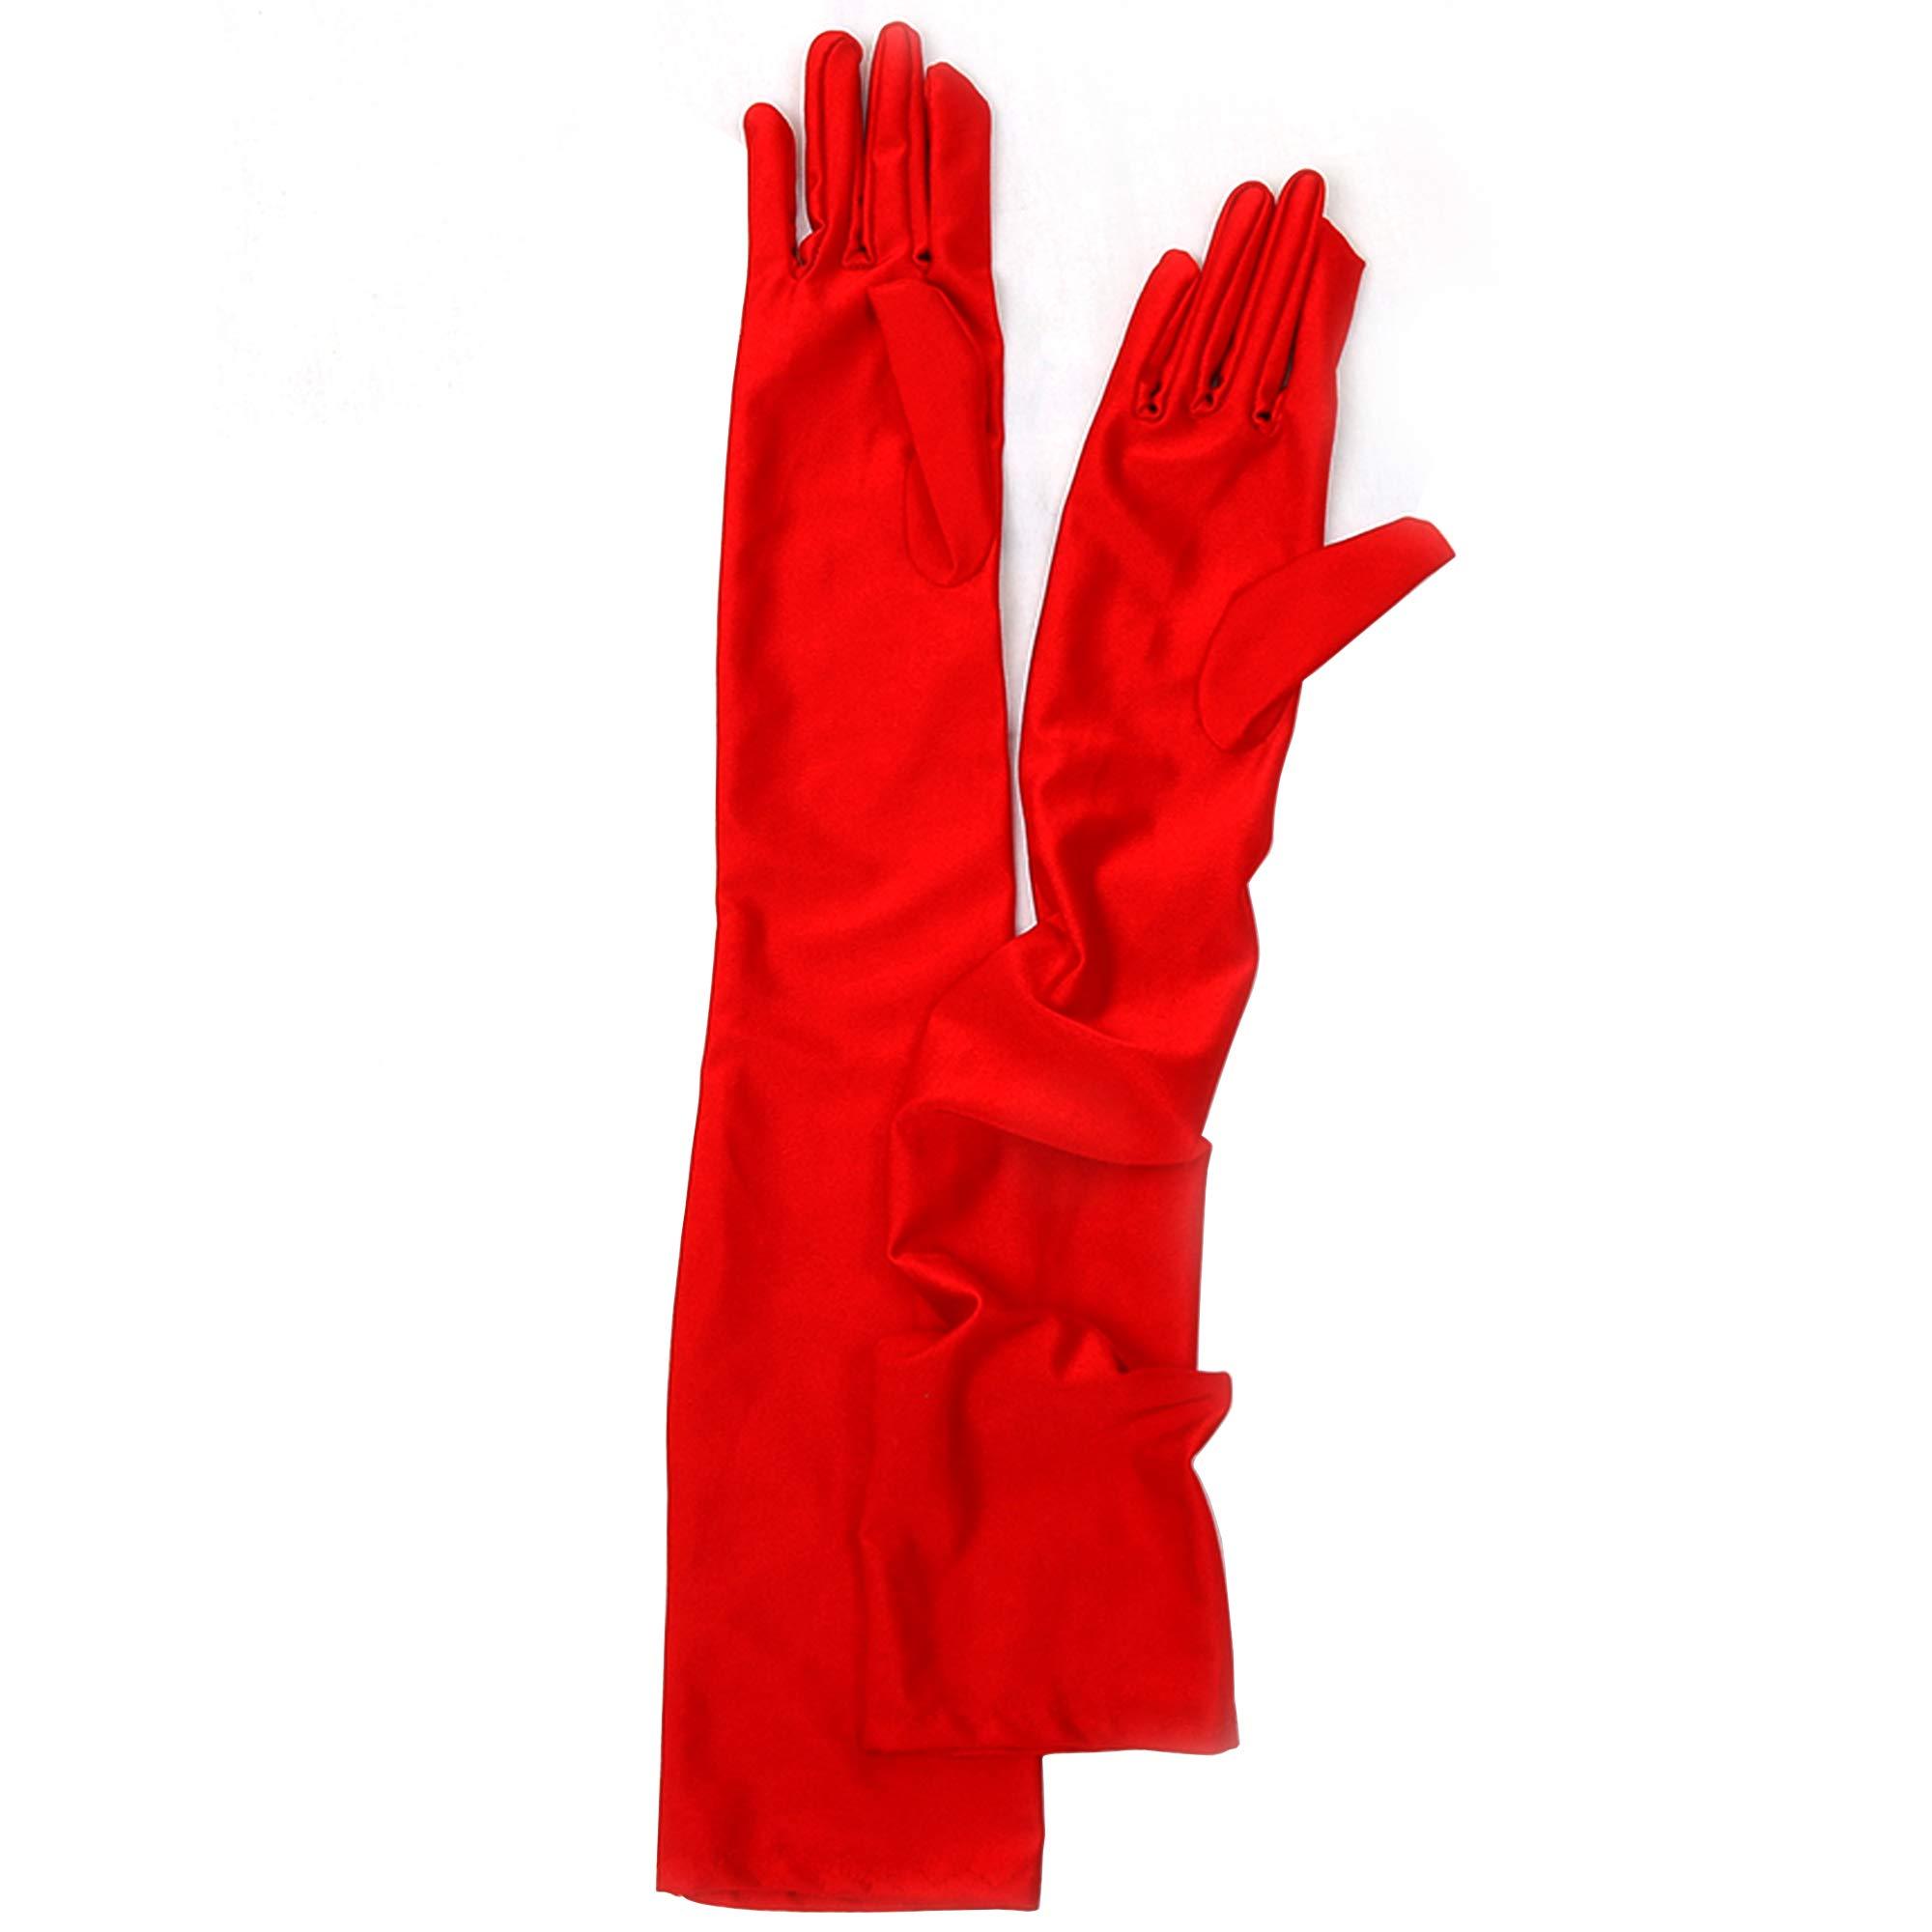 Skeleteen Red Satin Opera Gloves - Roaring 20's Fancy Flapper Elbow Gloves - 1 Pair by Skeleteen